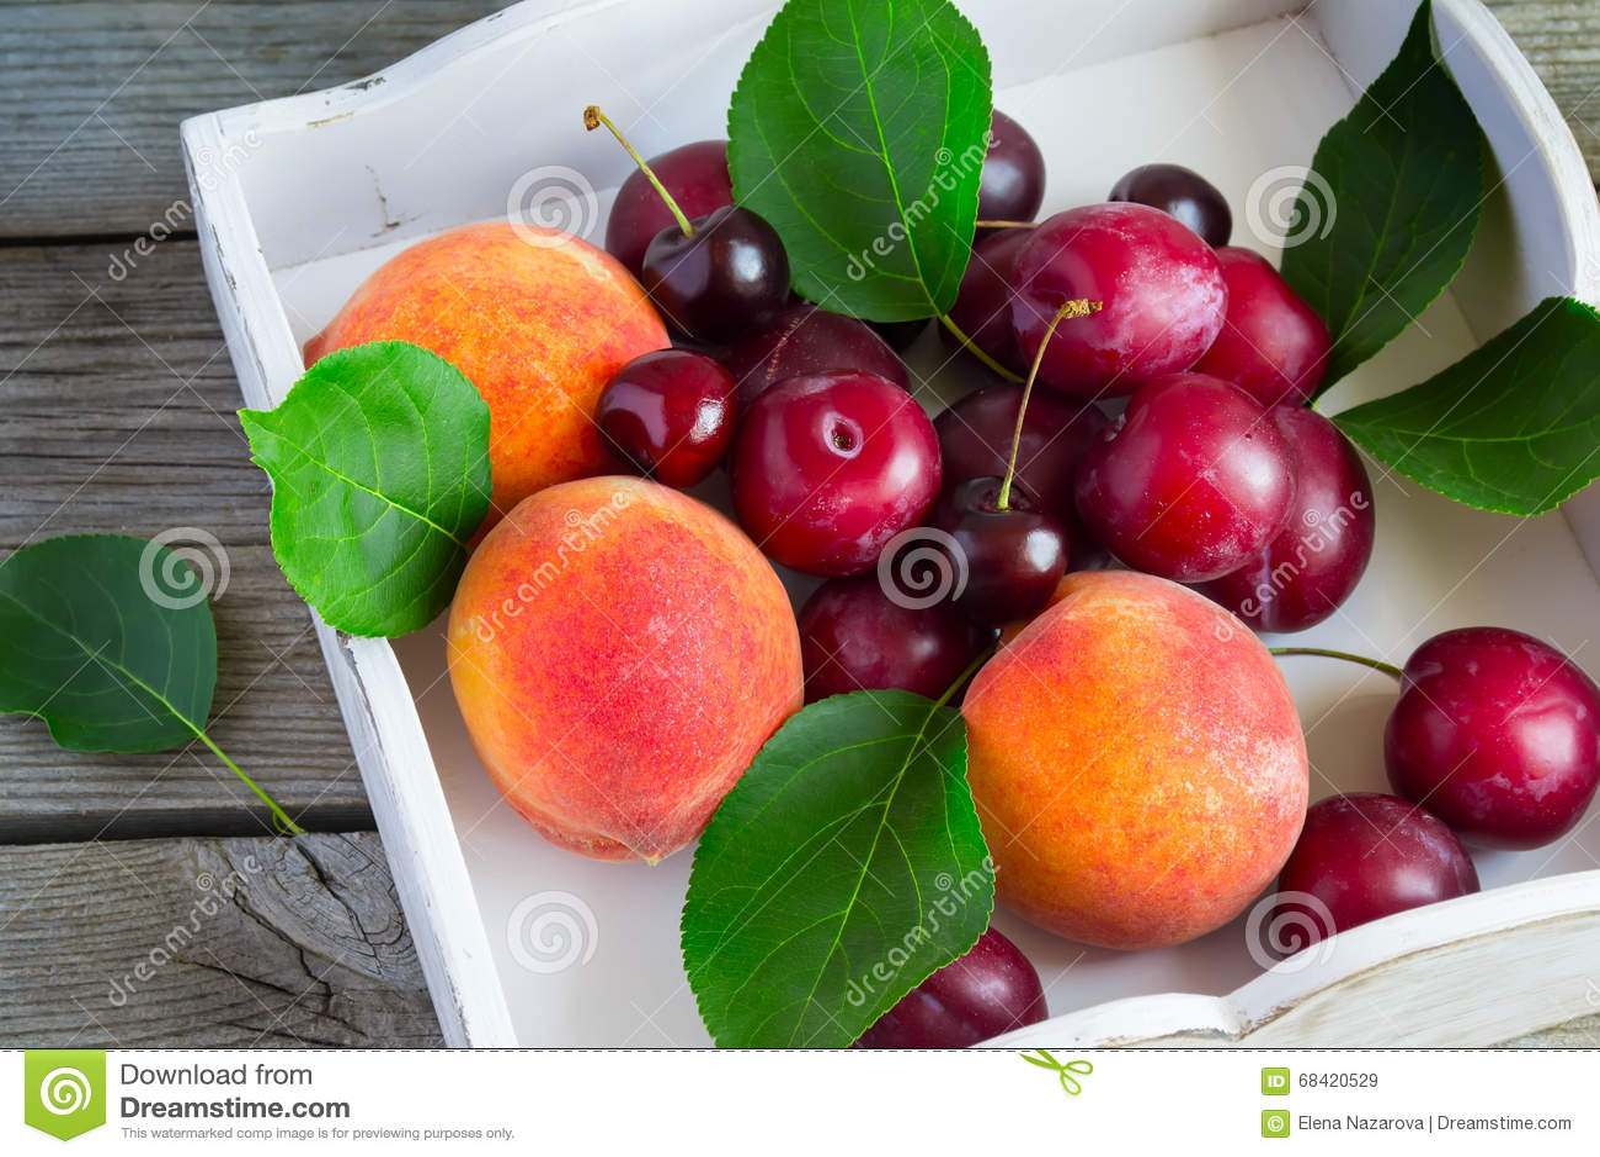 Insieme di frutta: pesche, prugne, ciliege su un vassoio bianco